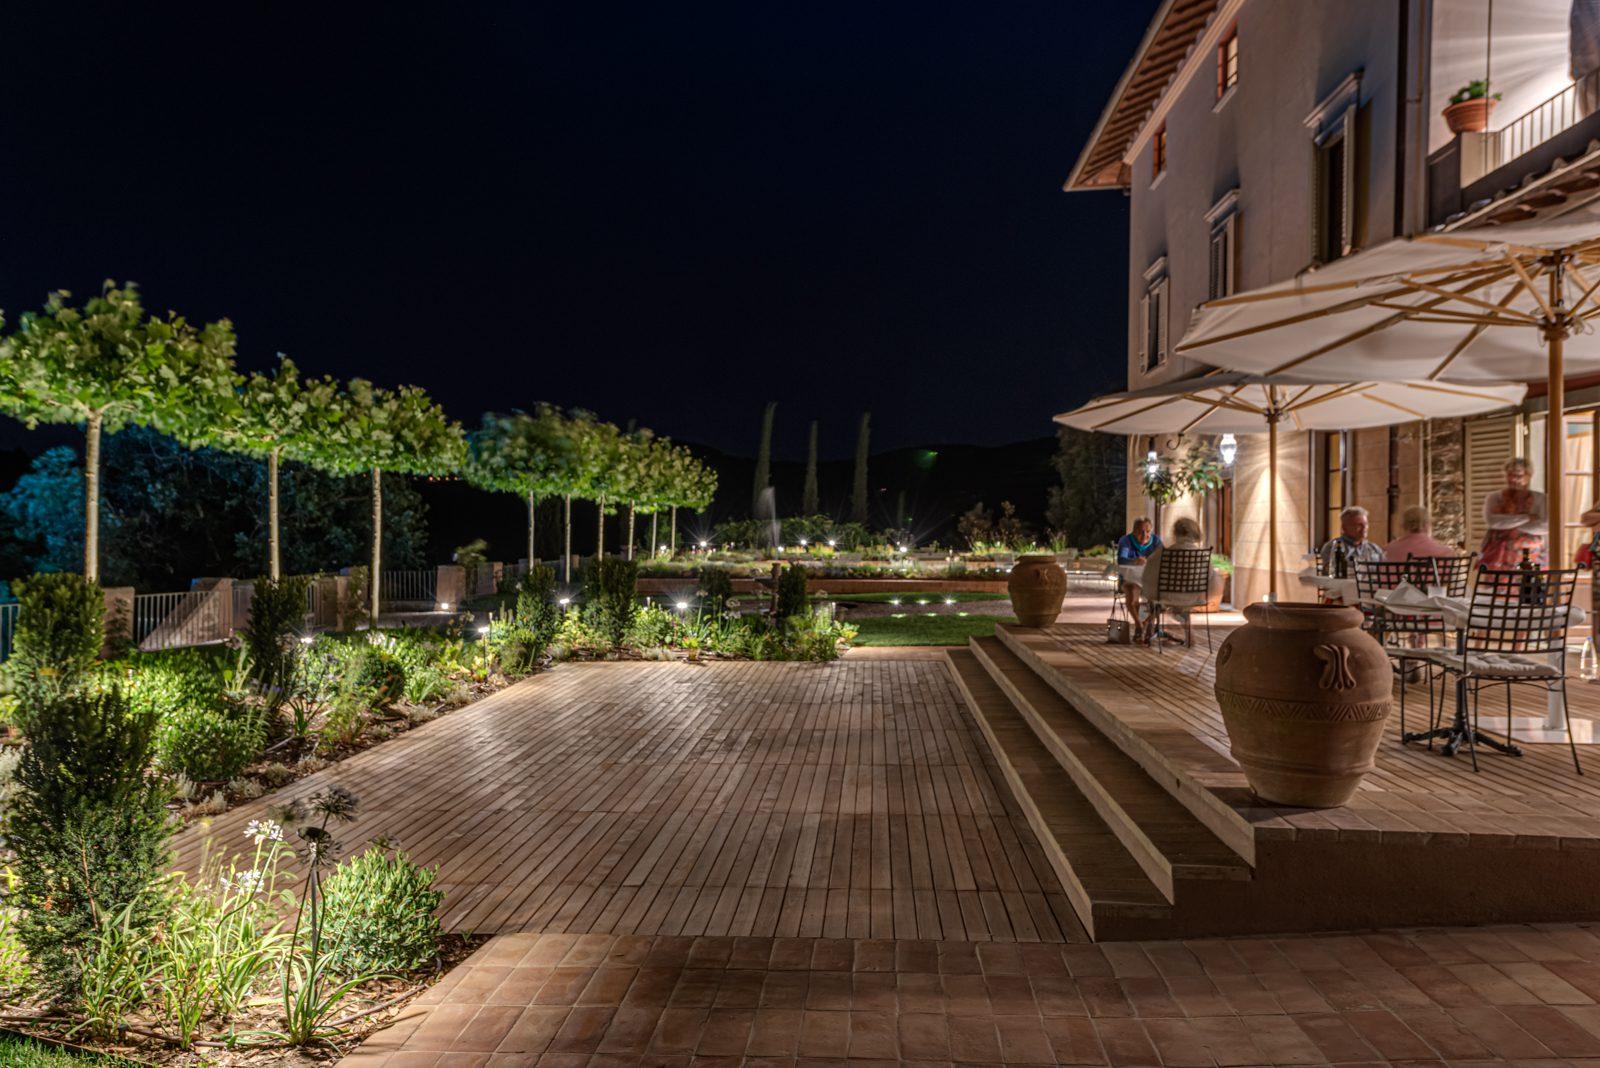 http://www.hotelvillacampomaggio.it/wp-content/uploads/2016/05/DSC8014.jpg